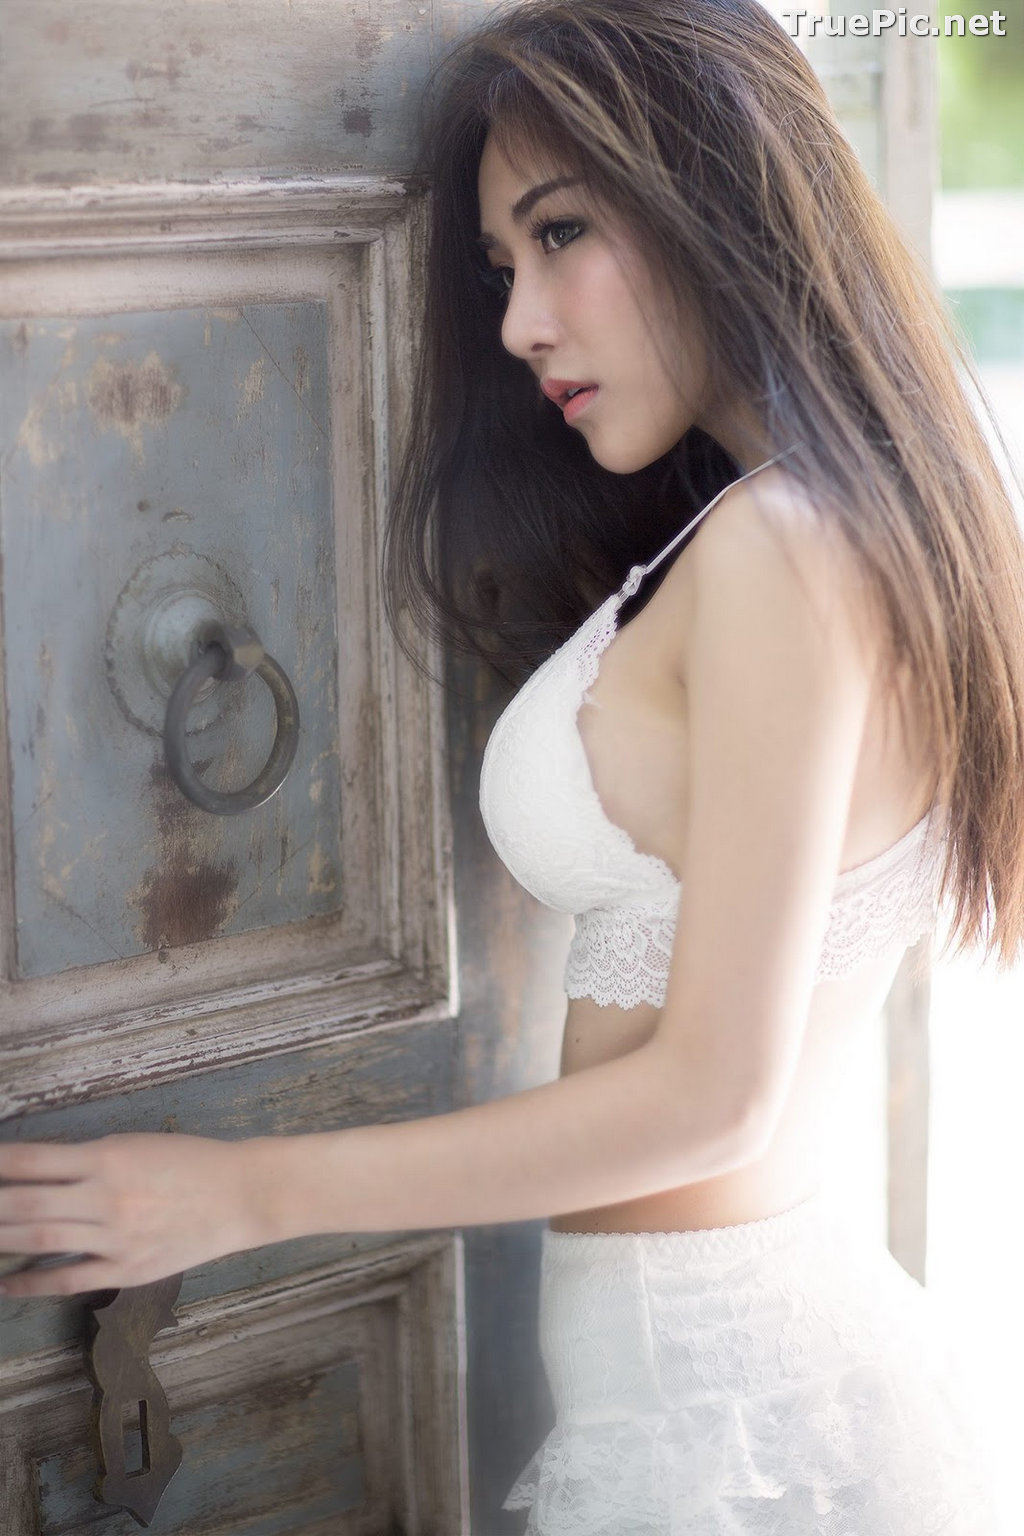 Image Thailand Model - Chotip Kungnang Jandahan - Concept Mini Sexy - TruePic.net - Picture-5